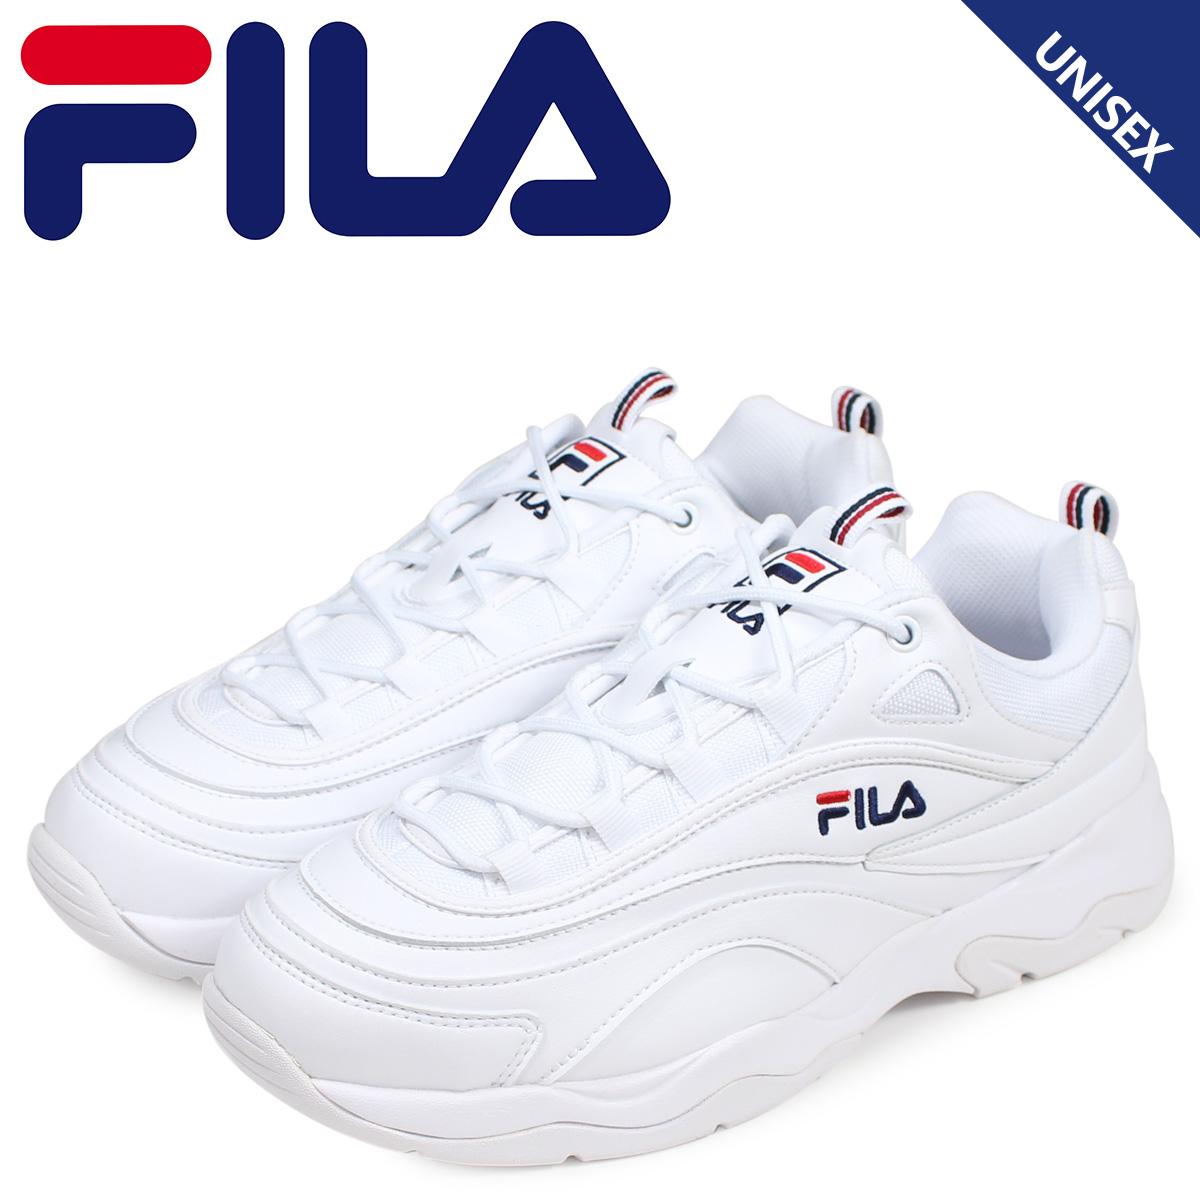 FILA Fila Fila lei sneakers men gap Dis FILARAY white white FS1SIA1160X